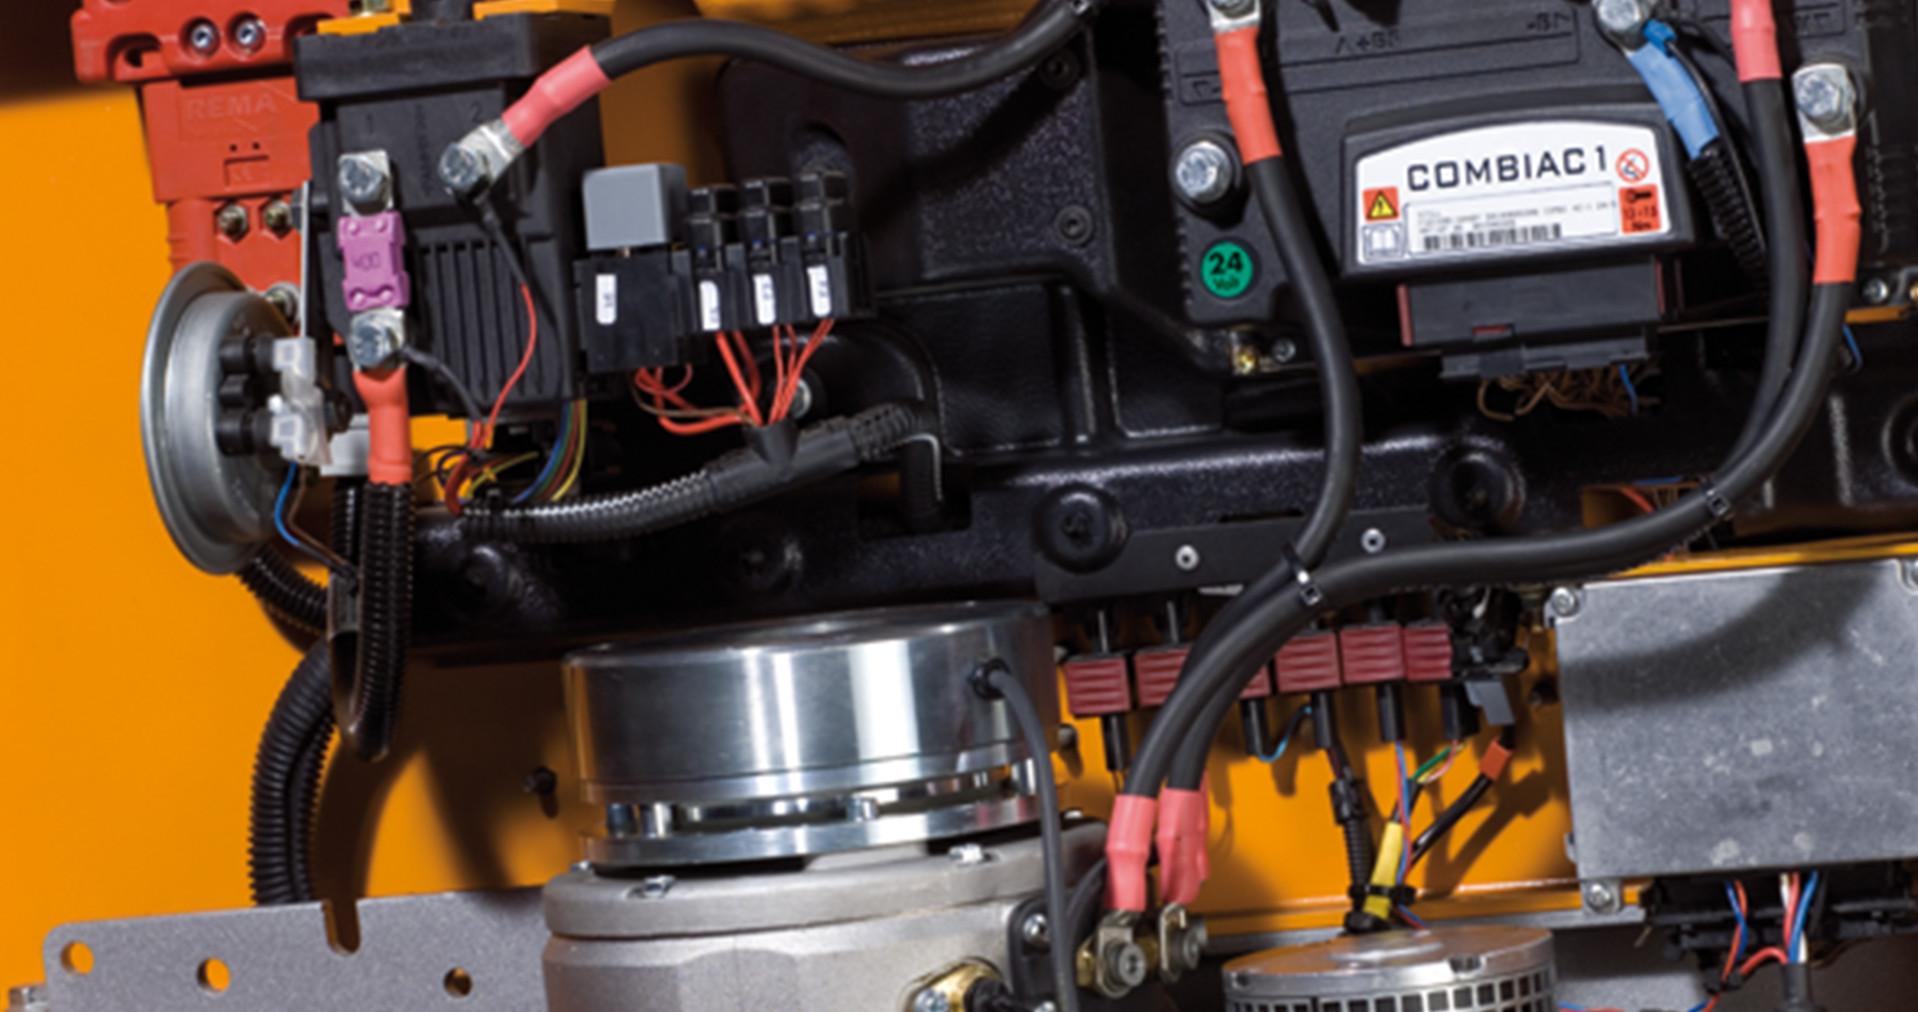 /products/Service/Spareparts/STILL_Original_Electronic_Components/images/STILL_Grafikproduktion_Service_Ersatzteile_Elektronikbauteile_4K.jpg